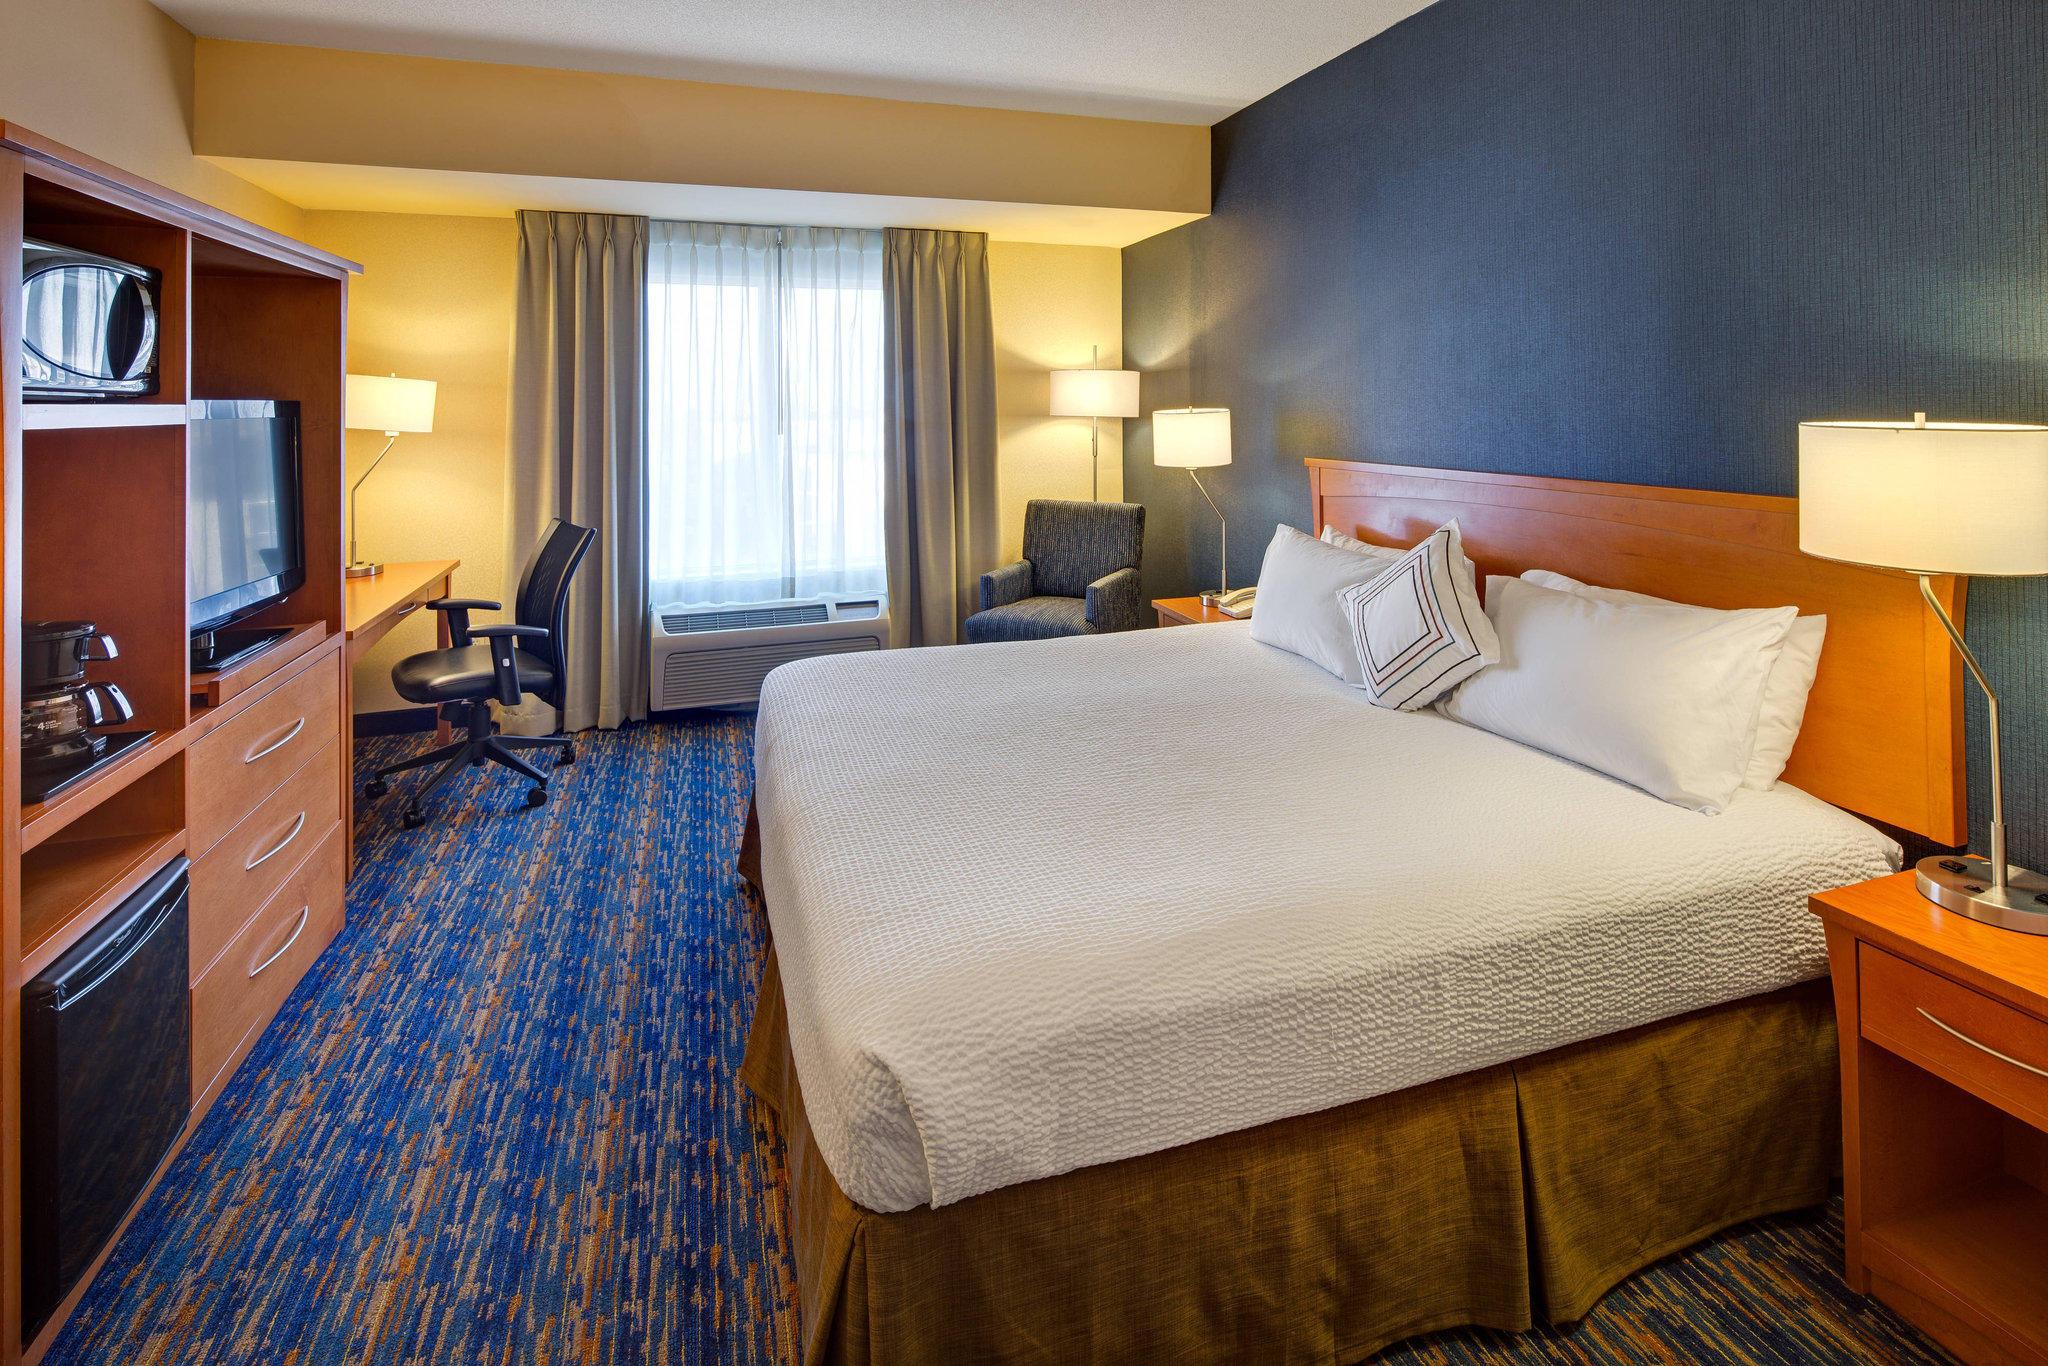 Fairfield Inn & Suites by Marriott Toronto Brampton